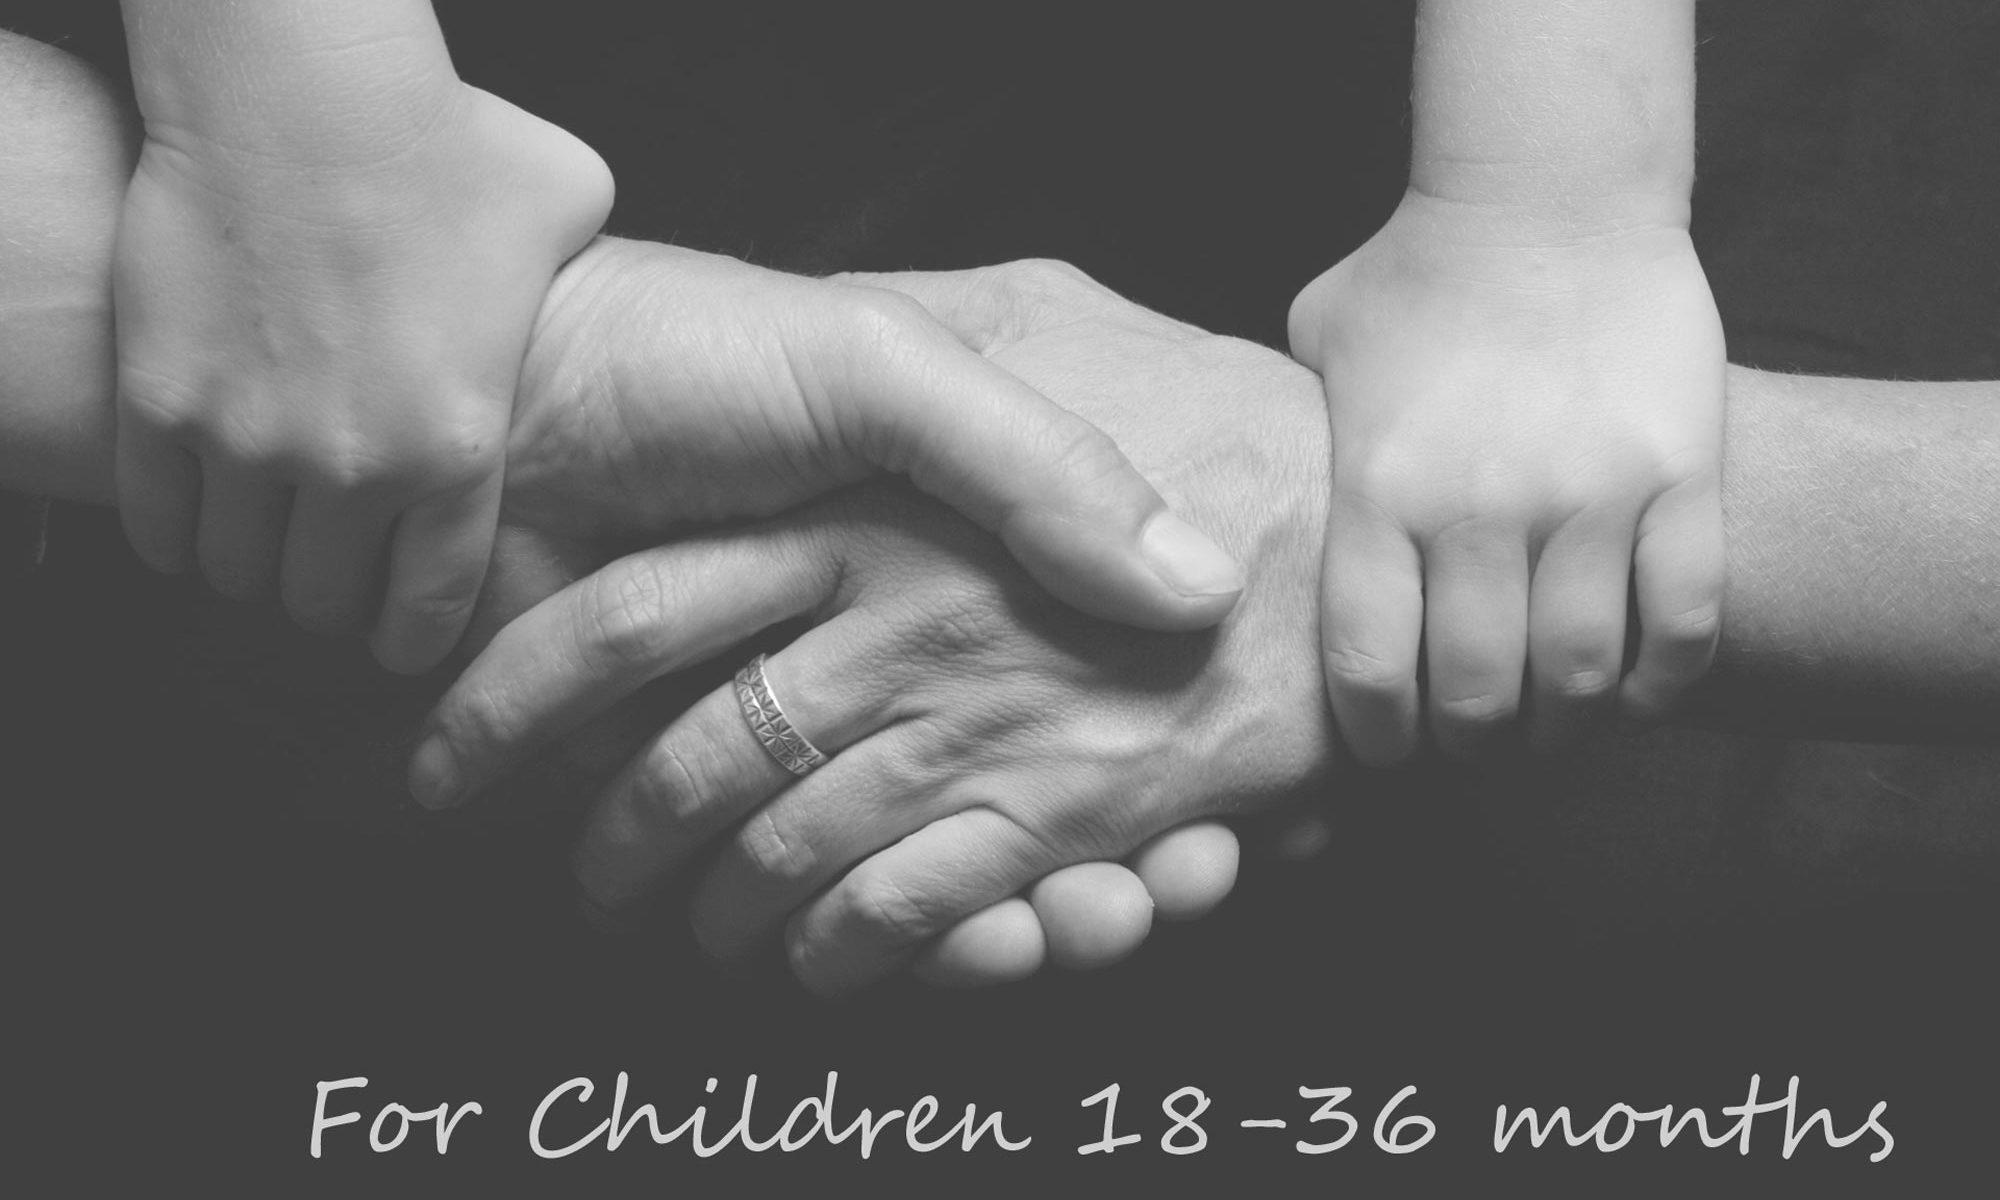 parenting plans for children 18-36 months old